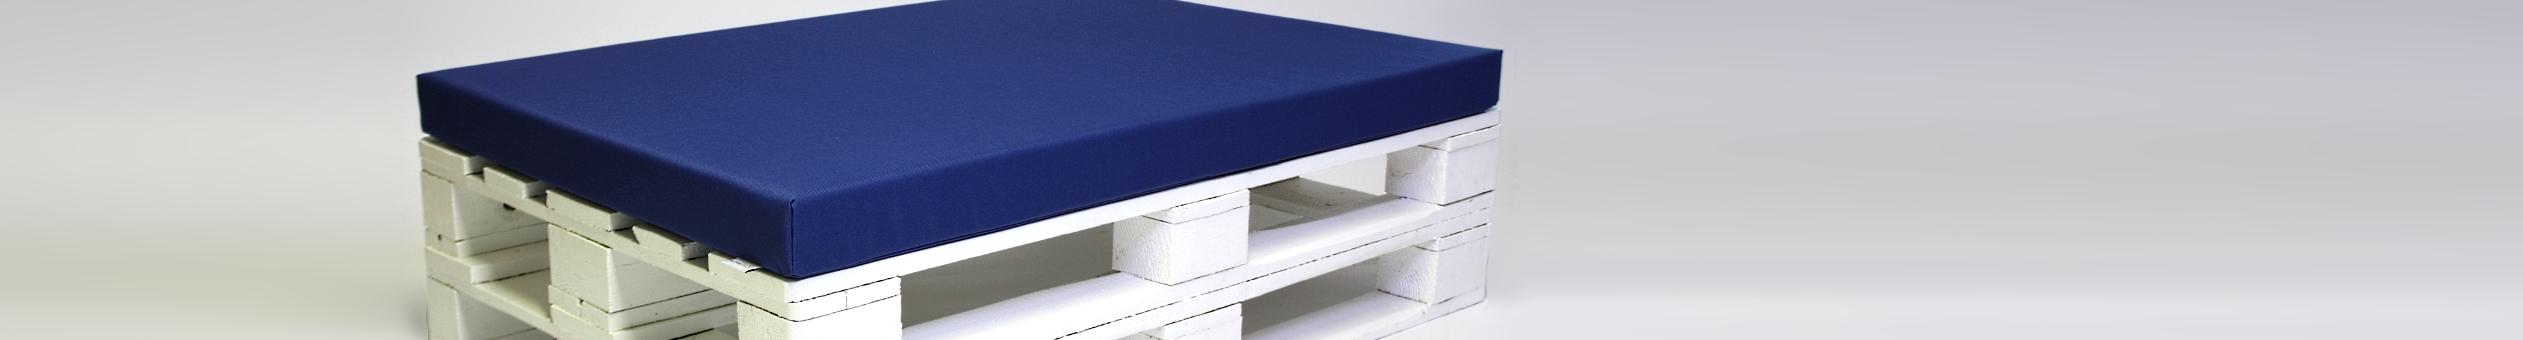 Palettenkissen Basic - Nylon - Kaufen bei SuperSack